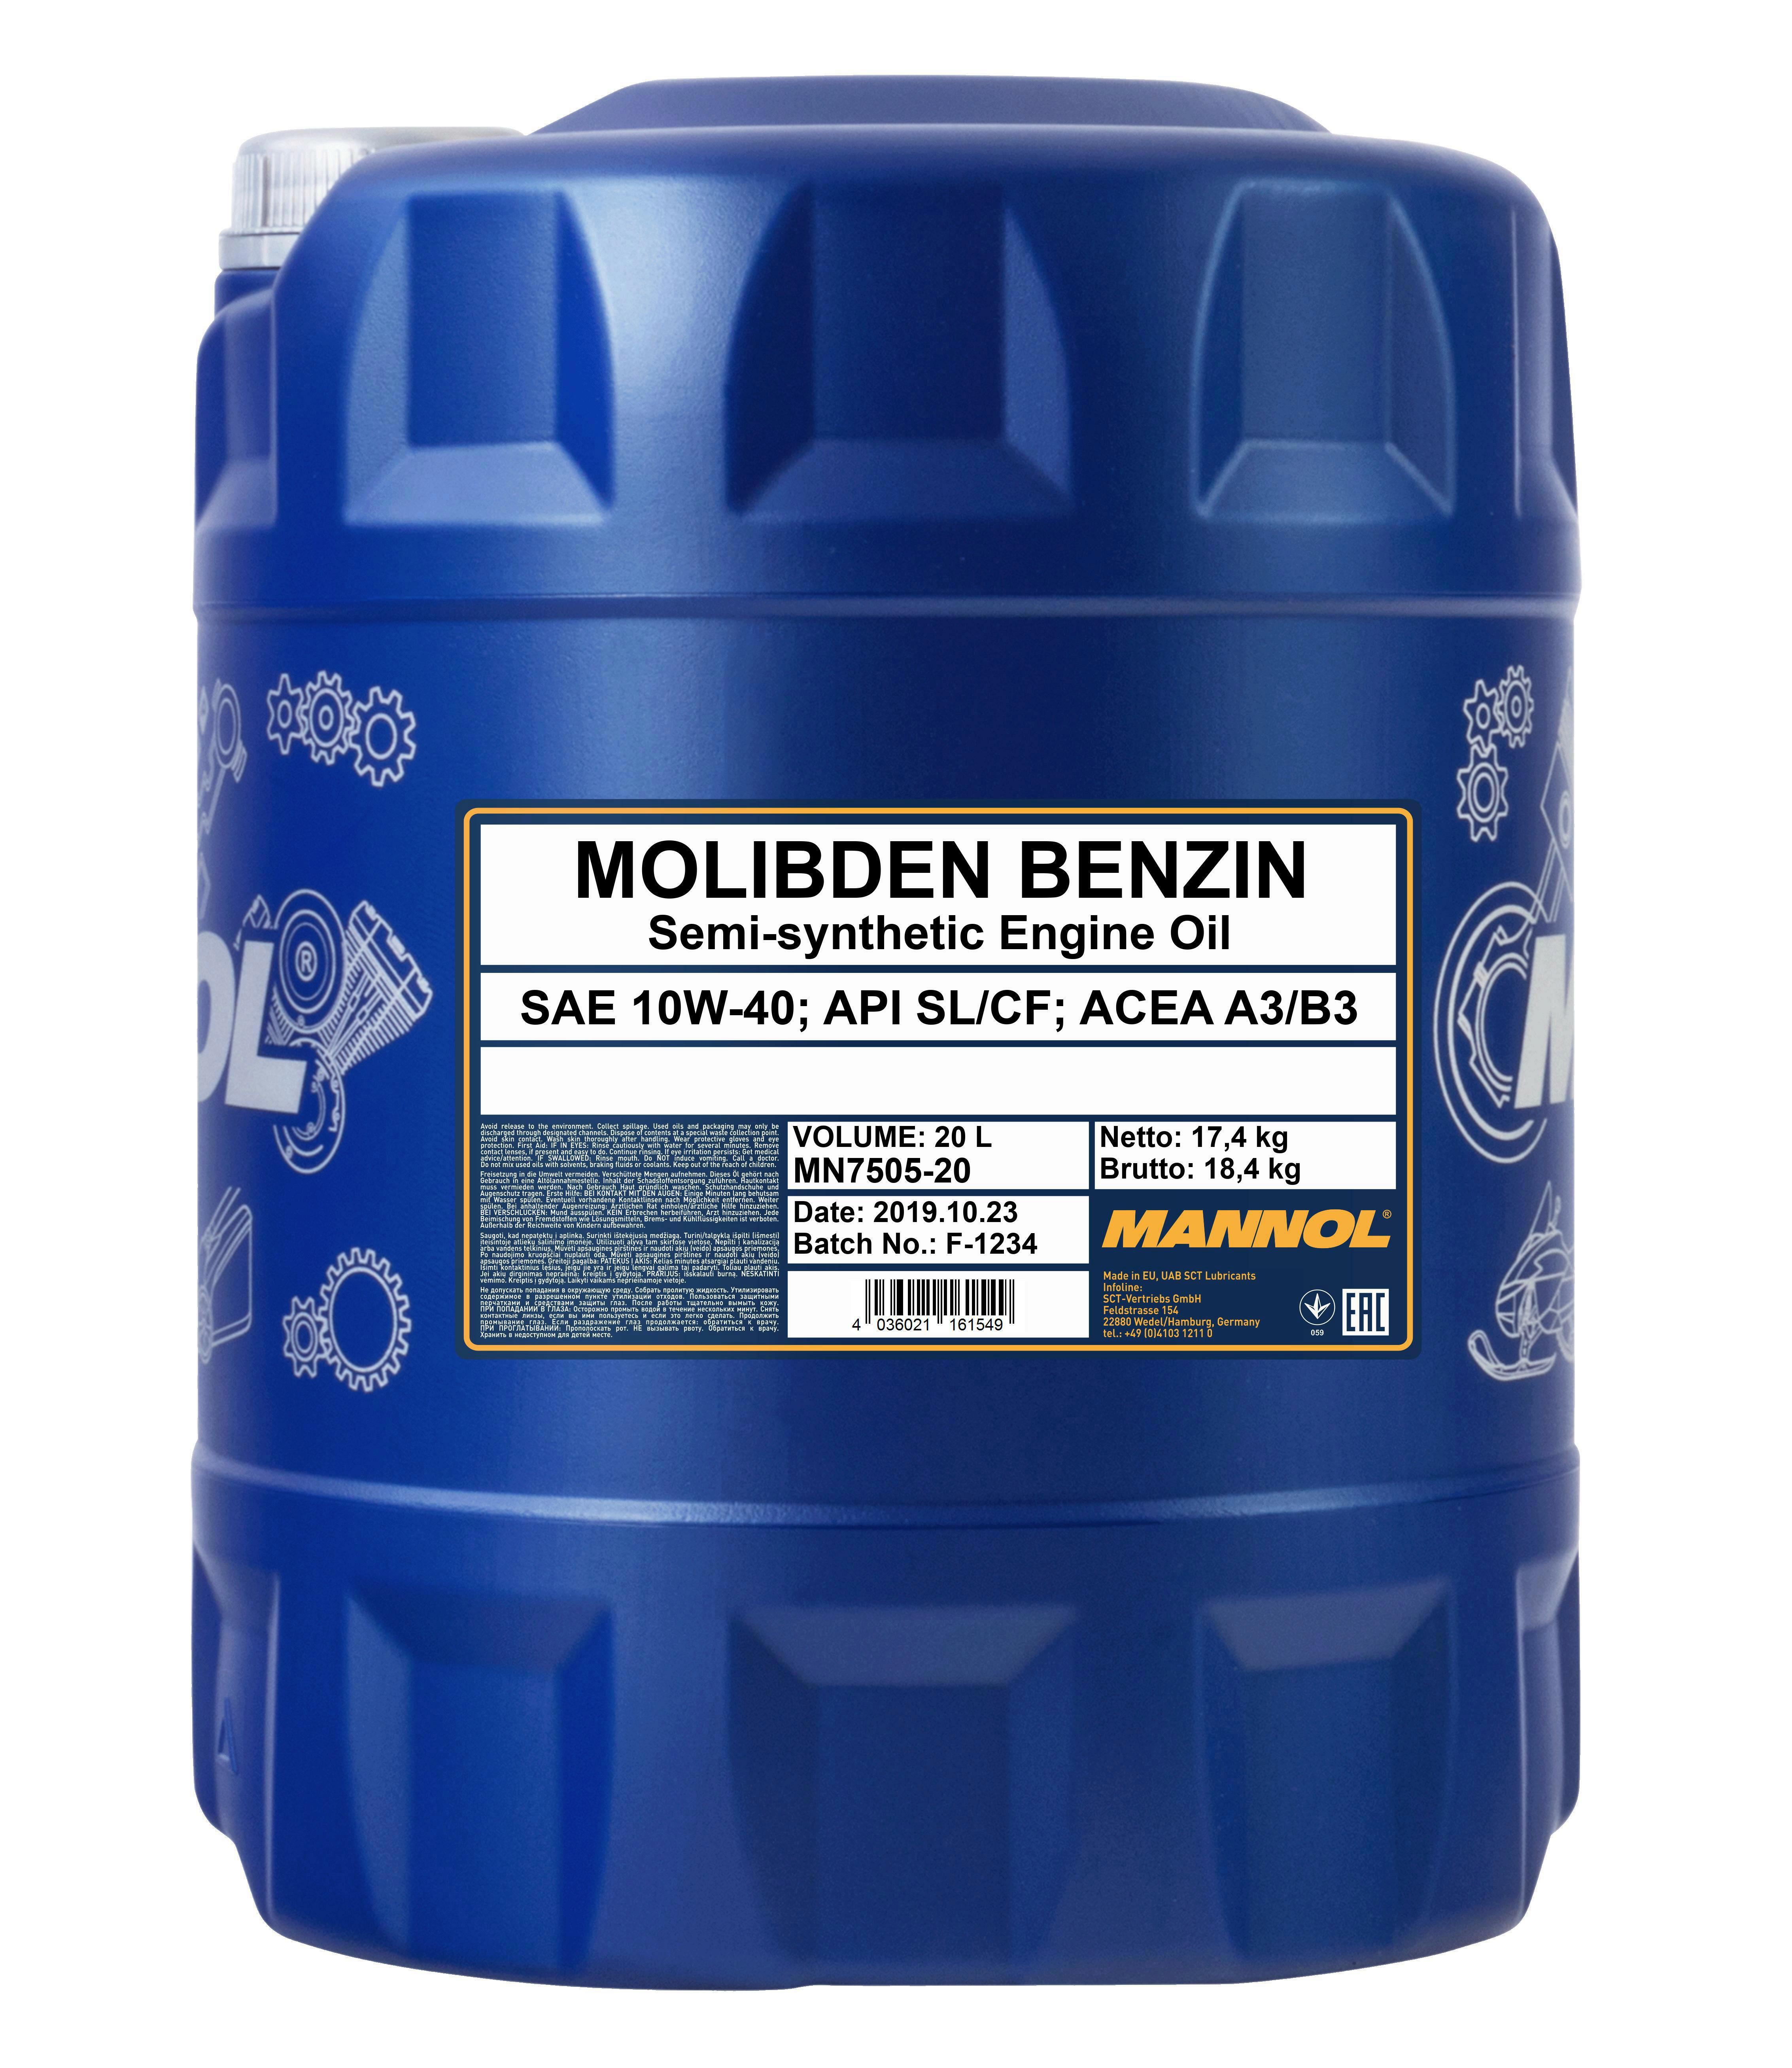 Motoröl MN Molibden Benzin 10W-40 20L